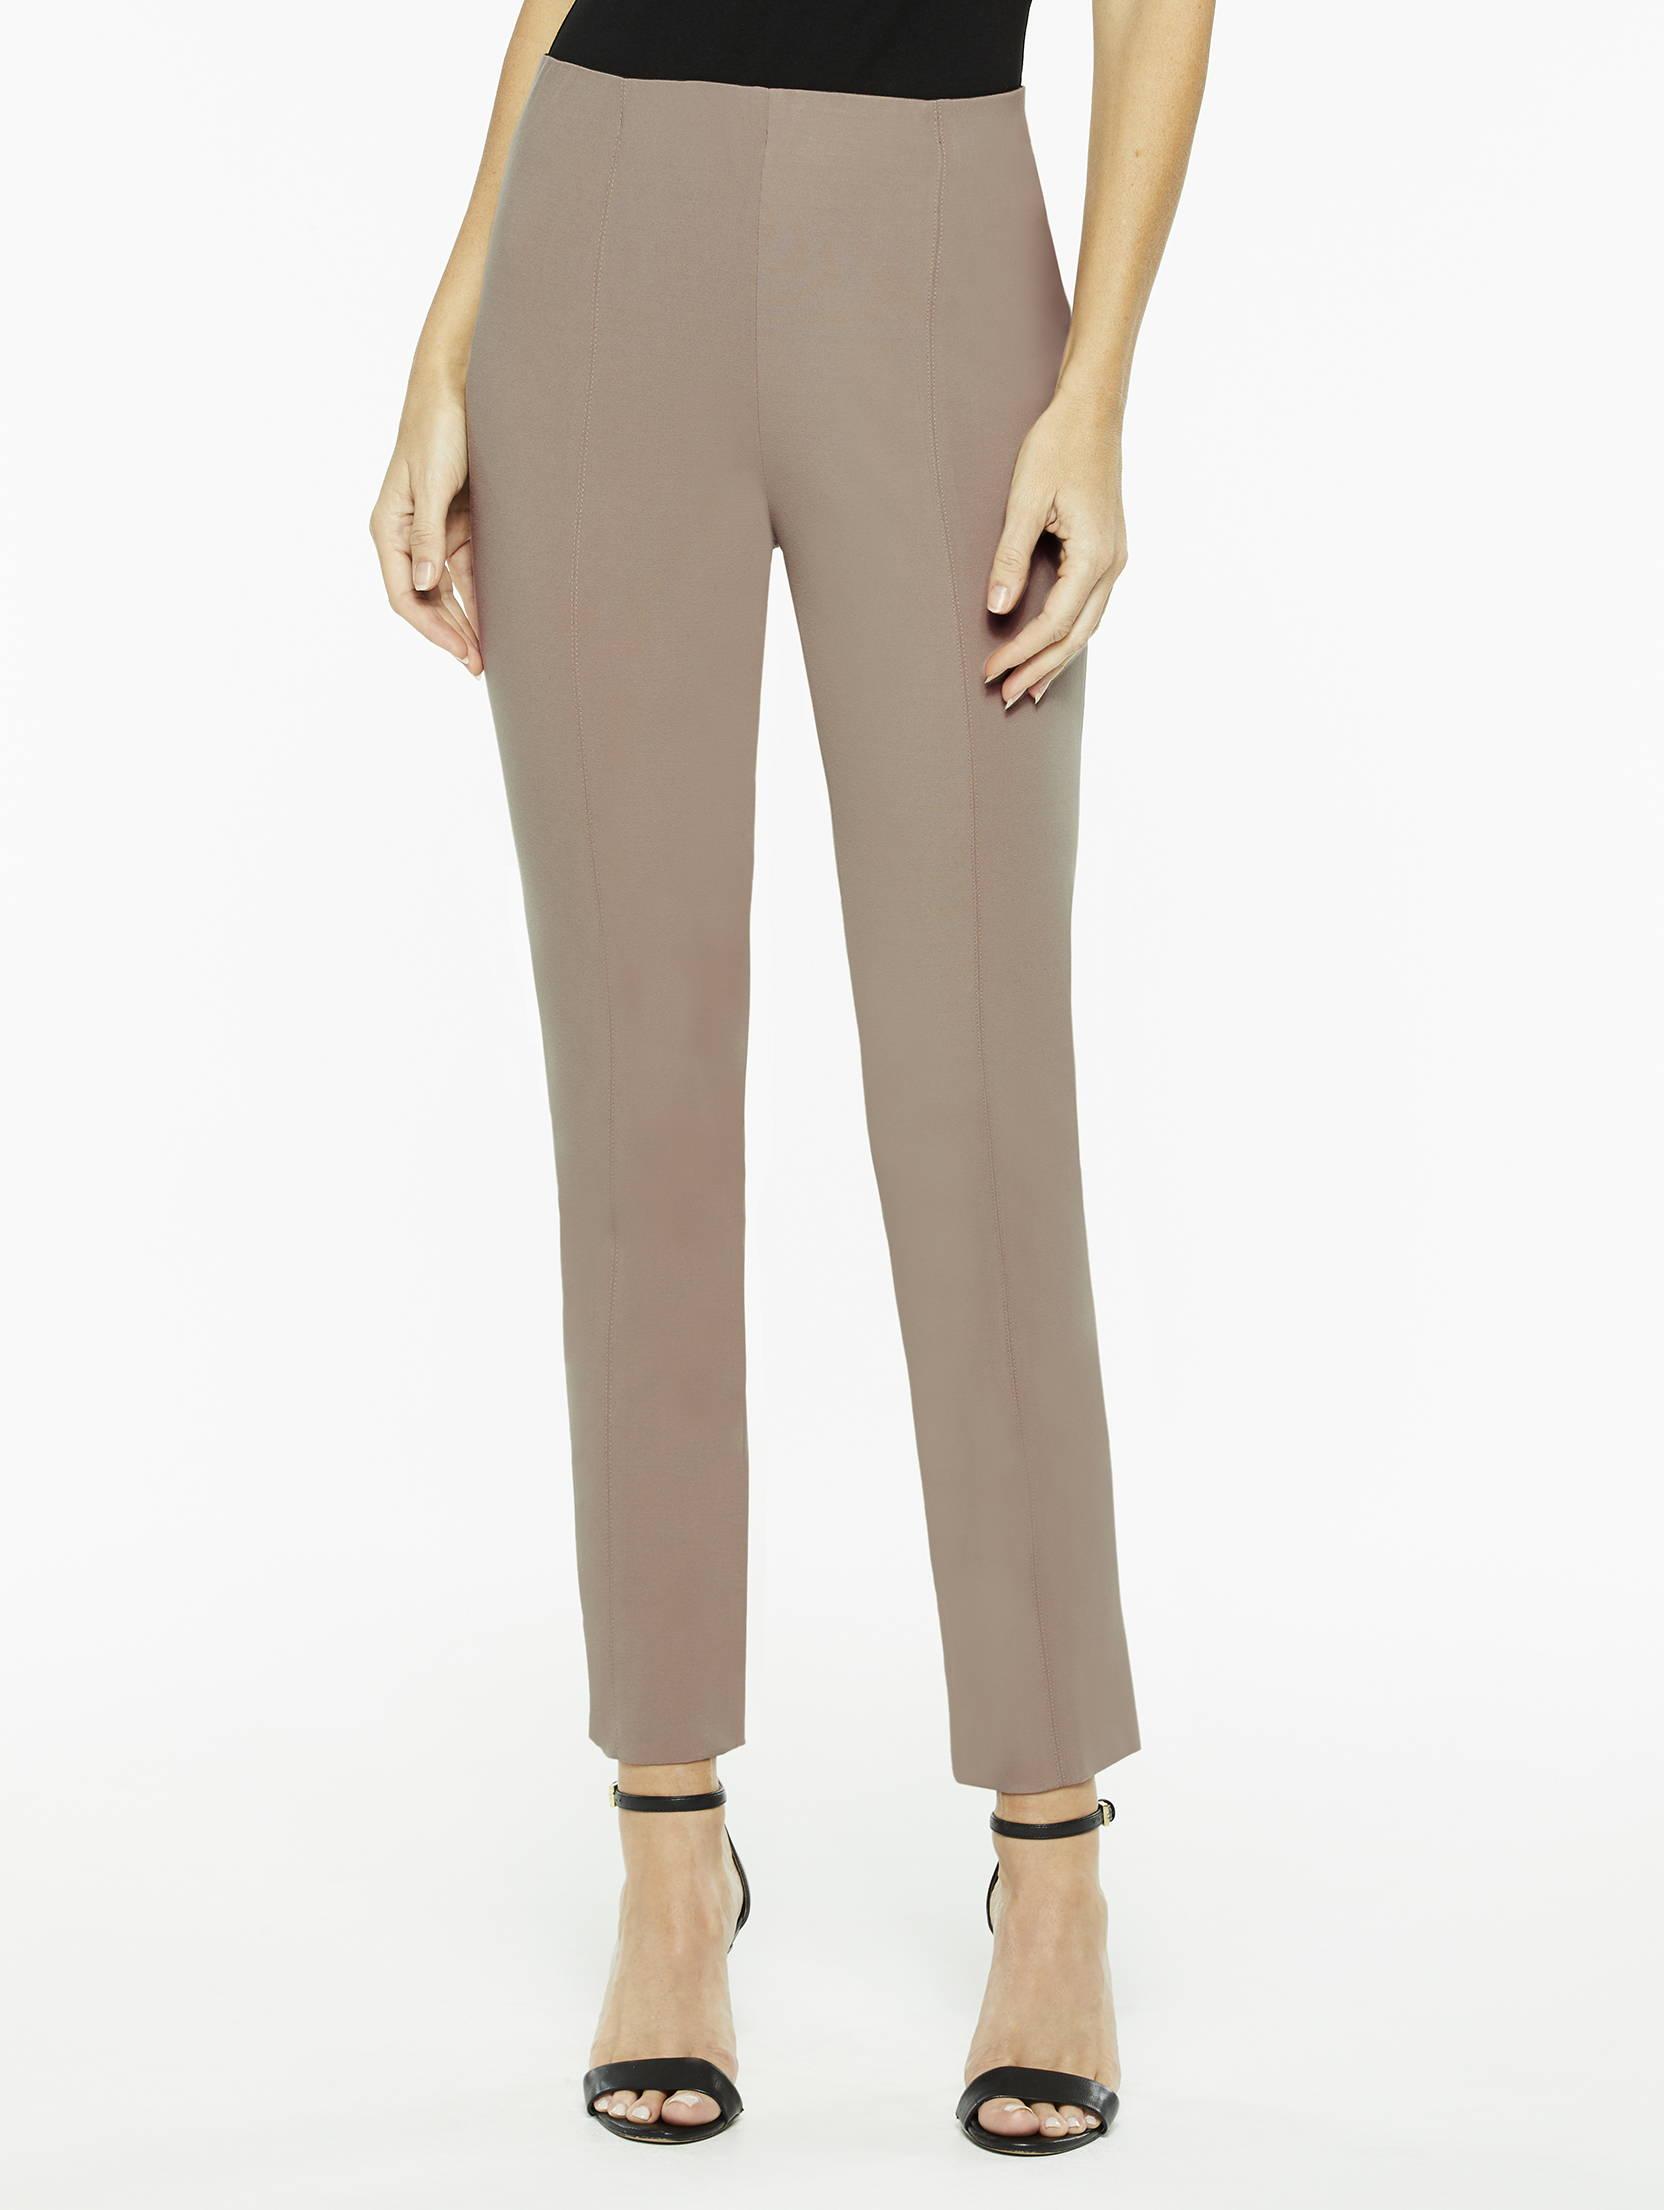 Seasonless Ponte Pull-On Pant in Macchiato Brown